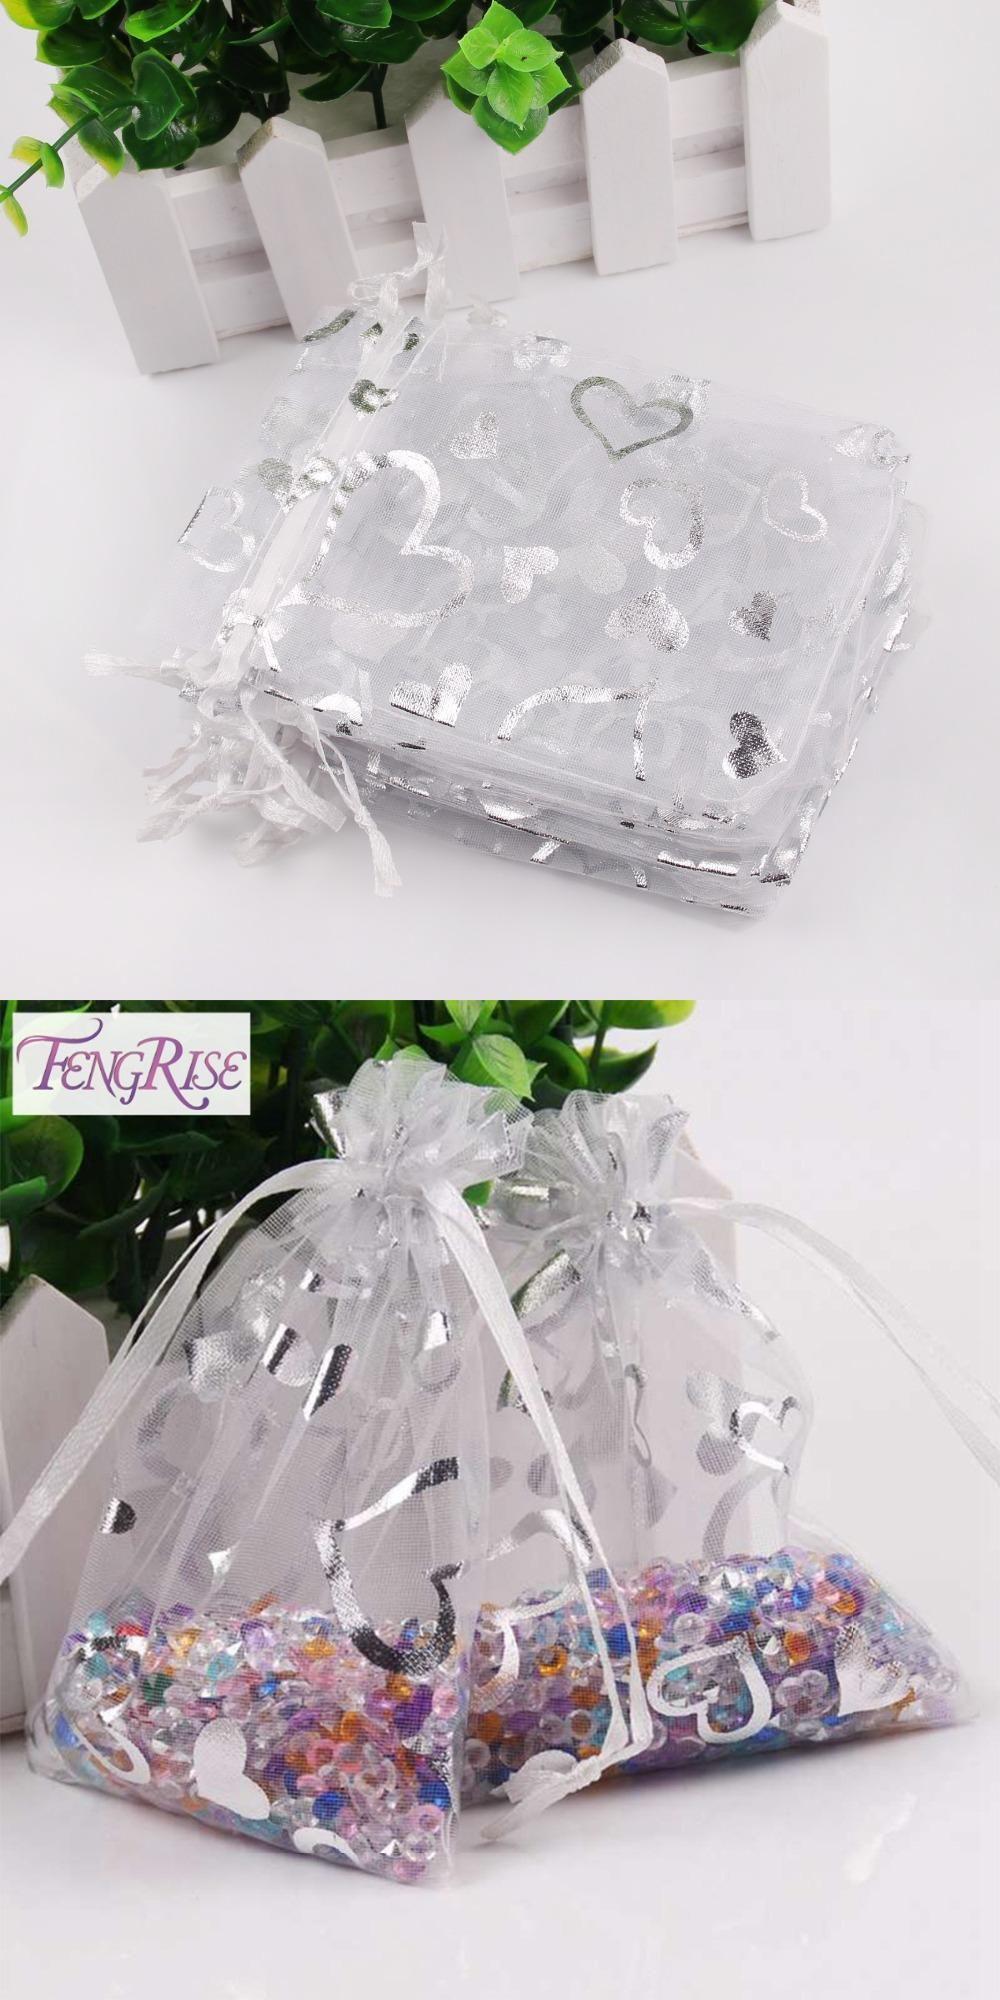 FENGRISE White Organza Bags 50Pcs Silver Heart Organza Pouches ...